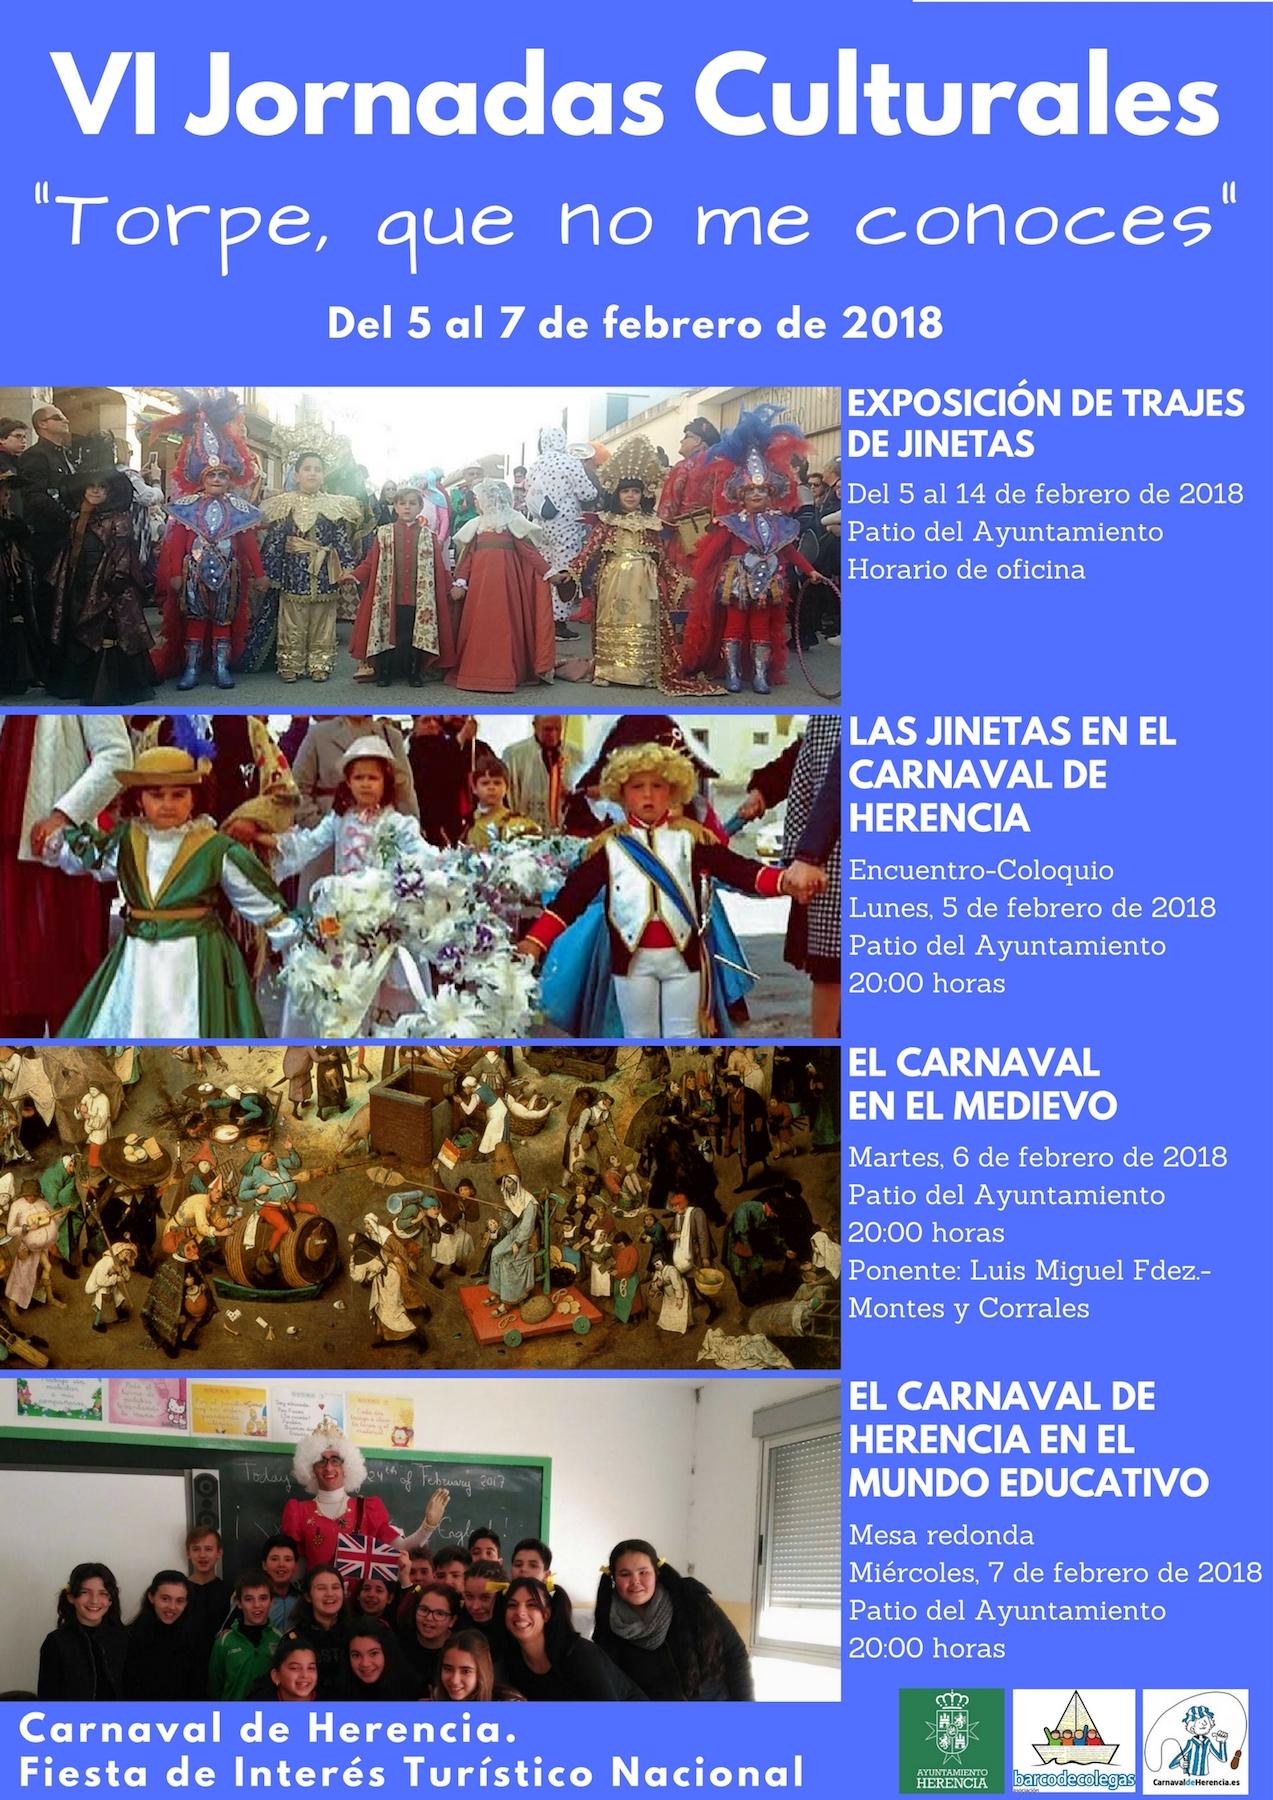 VI Jornadas Culturales del Carnaval de Herencia